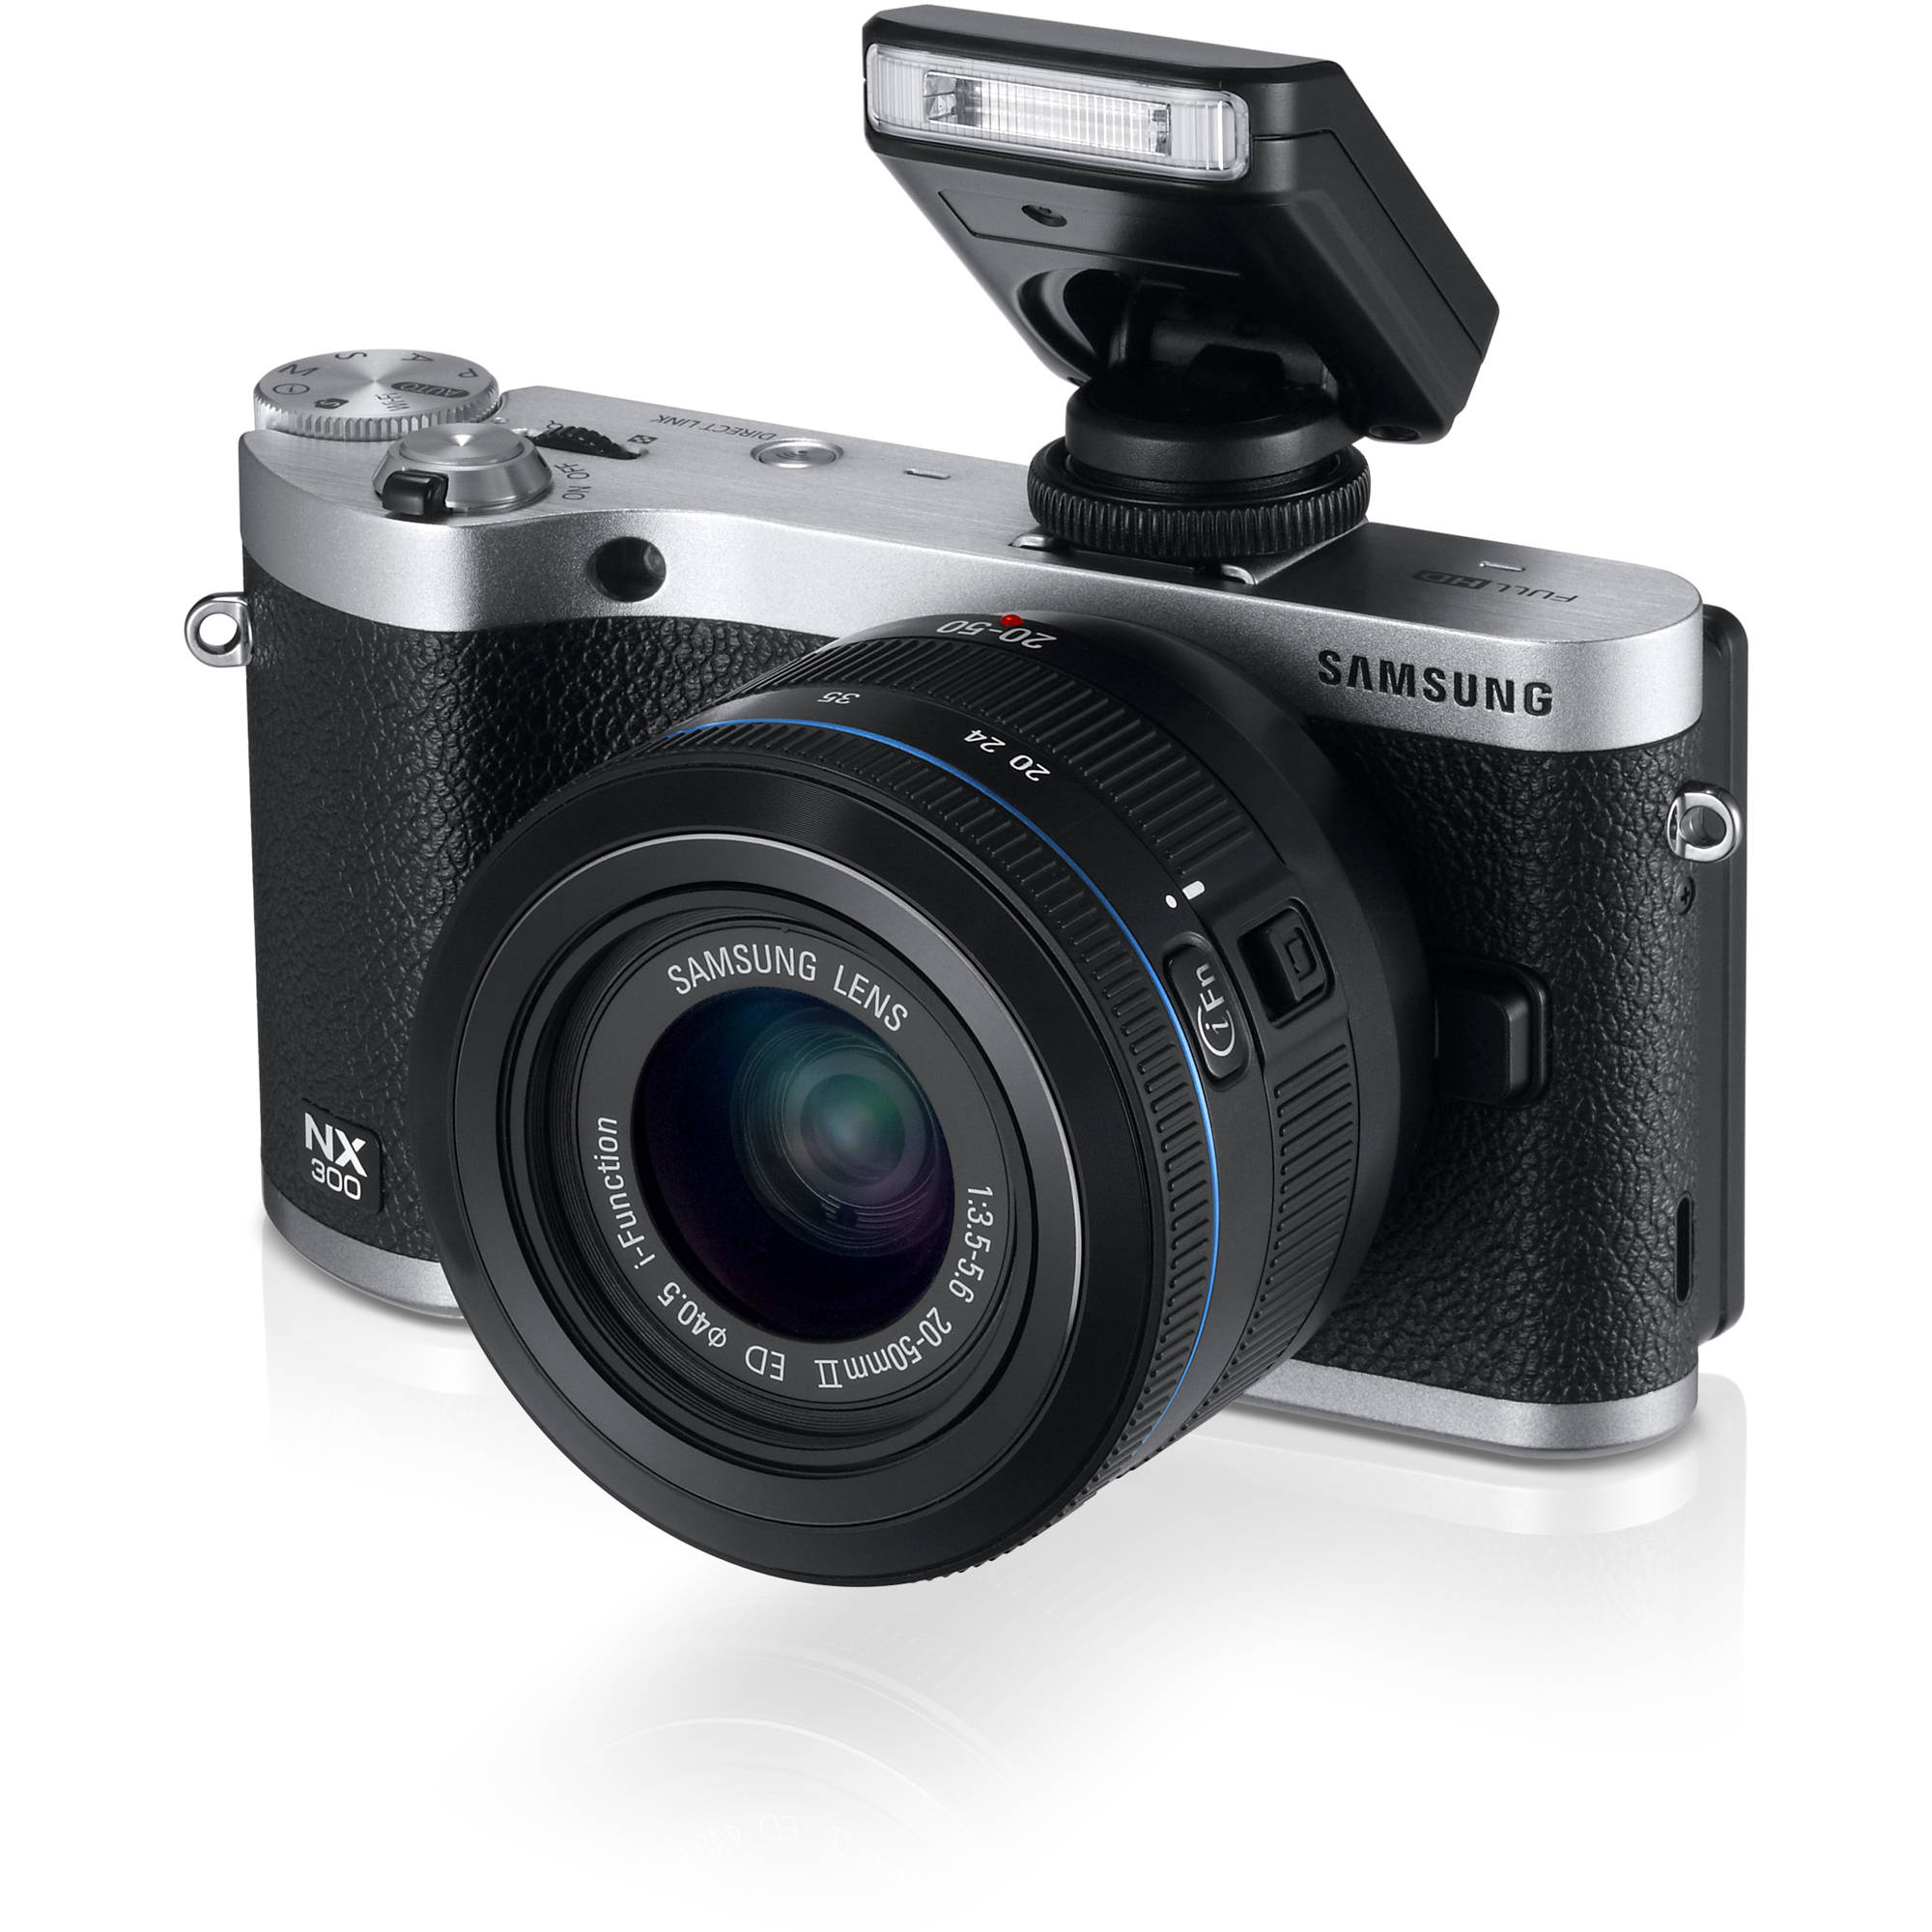 Samsung NX300 Camera Driver for Windows